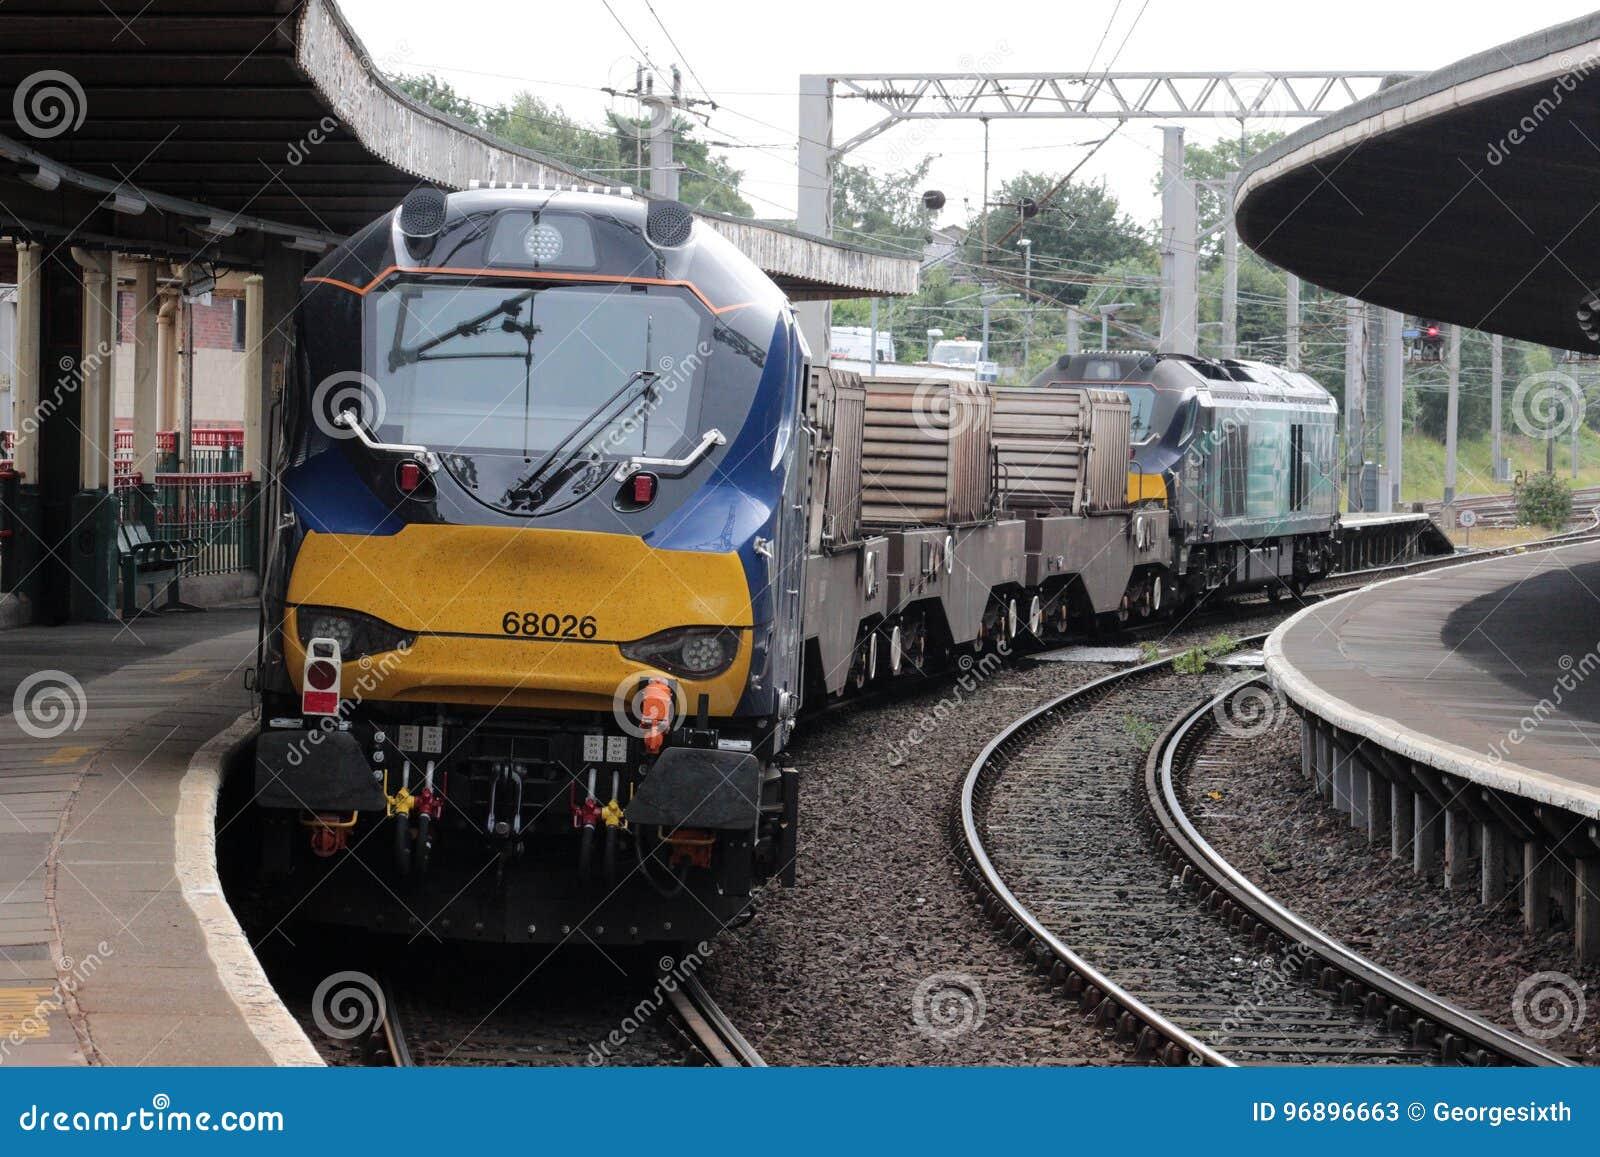 New diesel locomotive on nuclear flask train